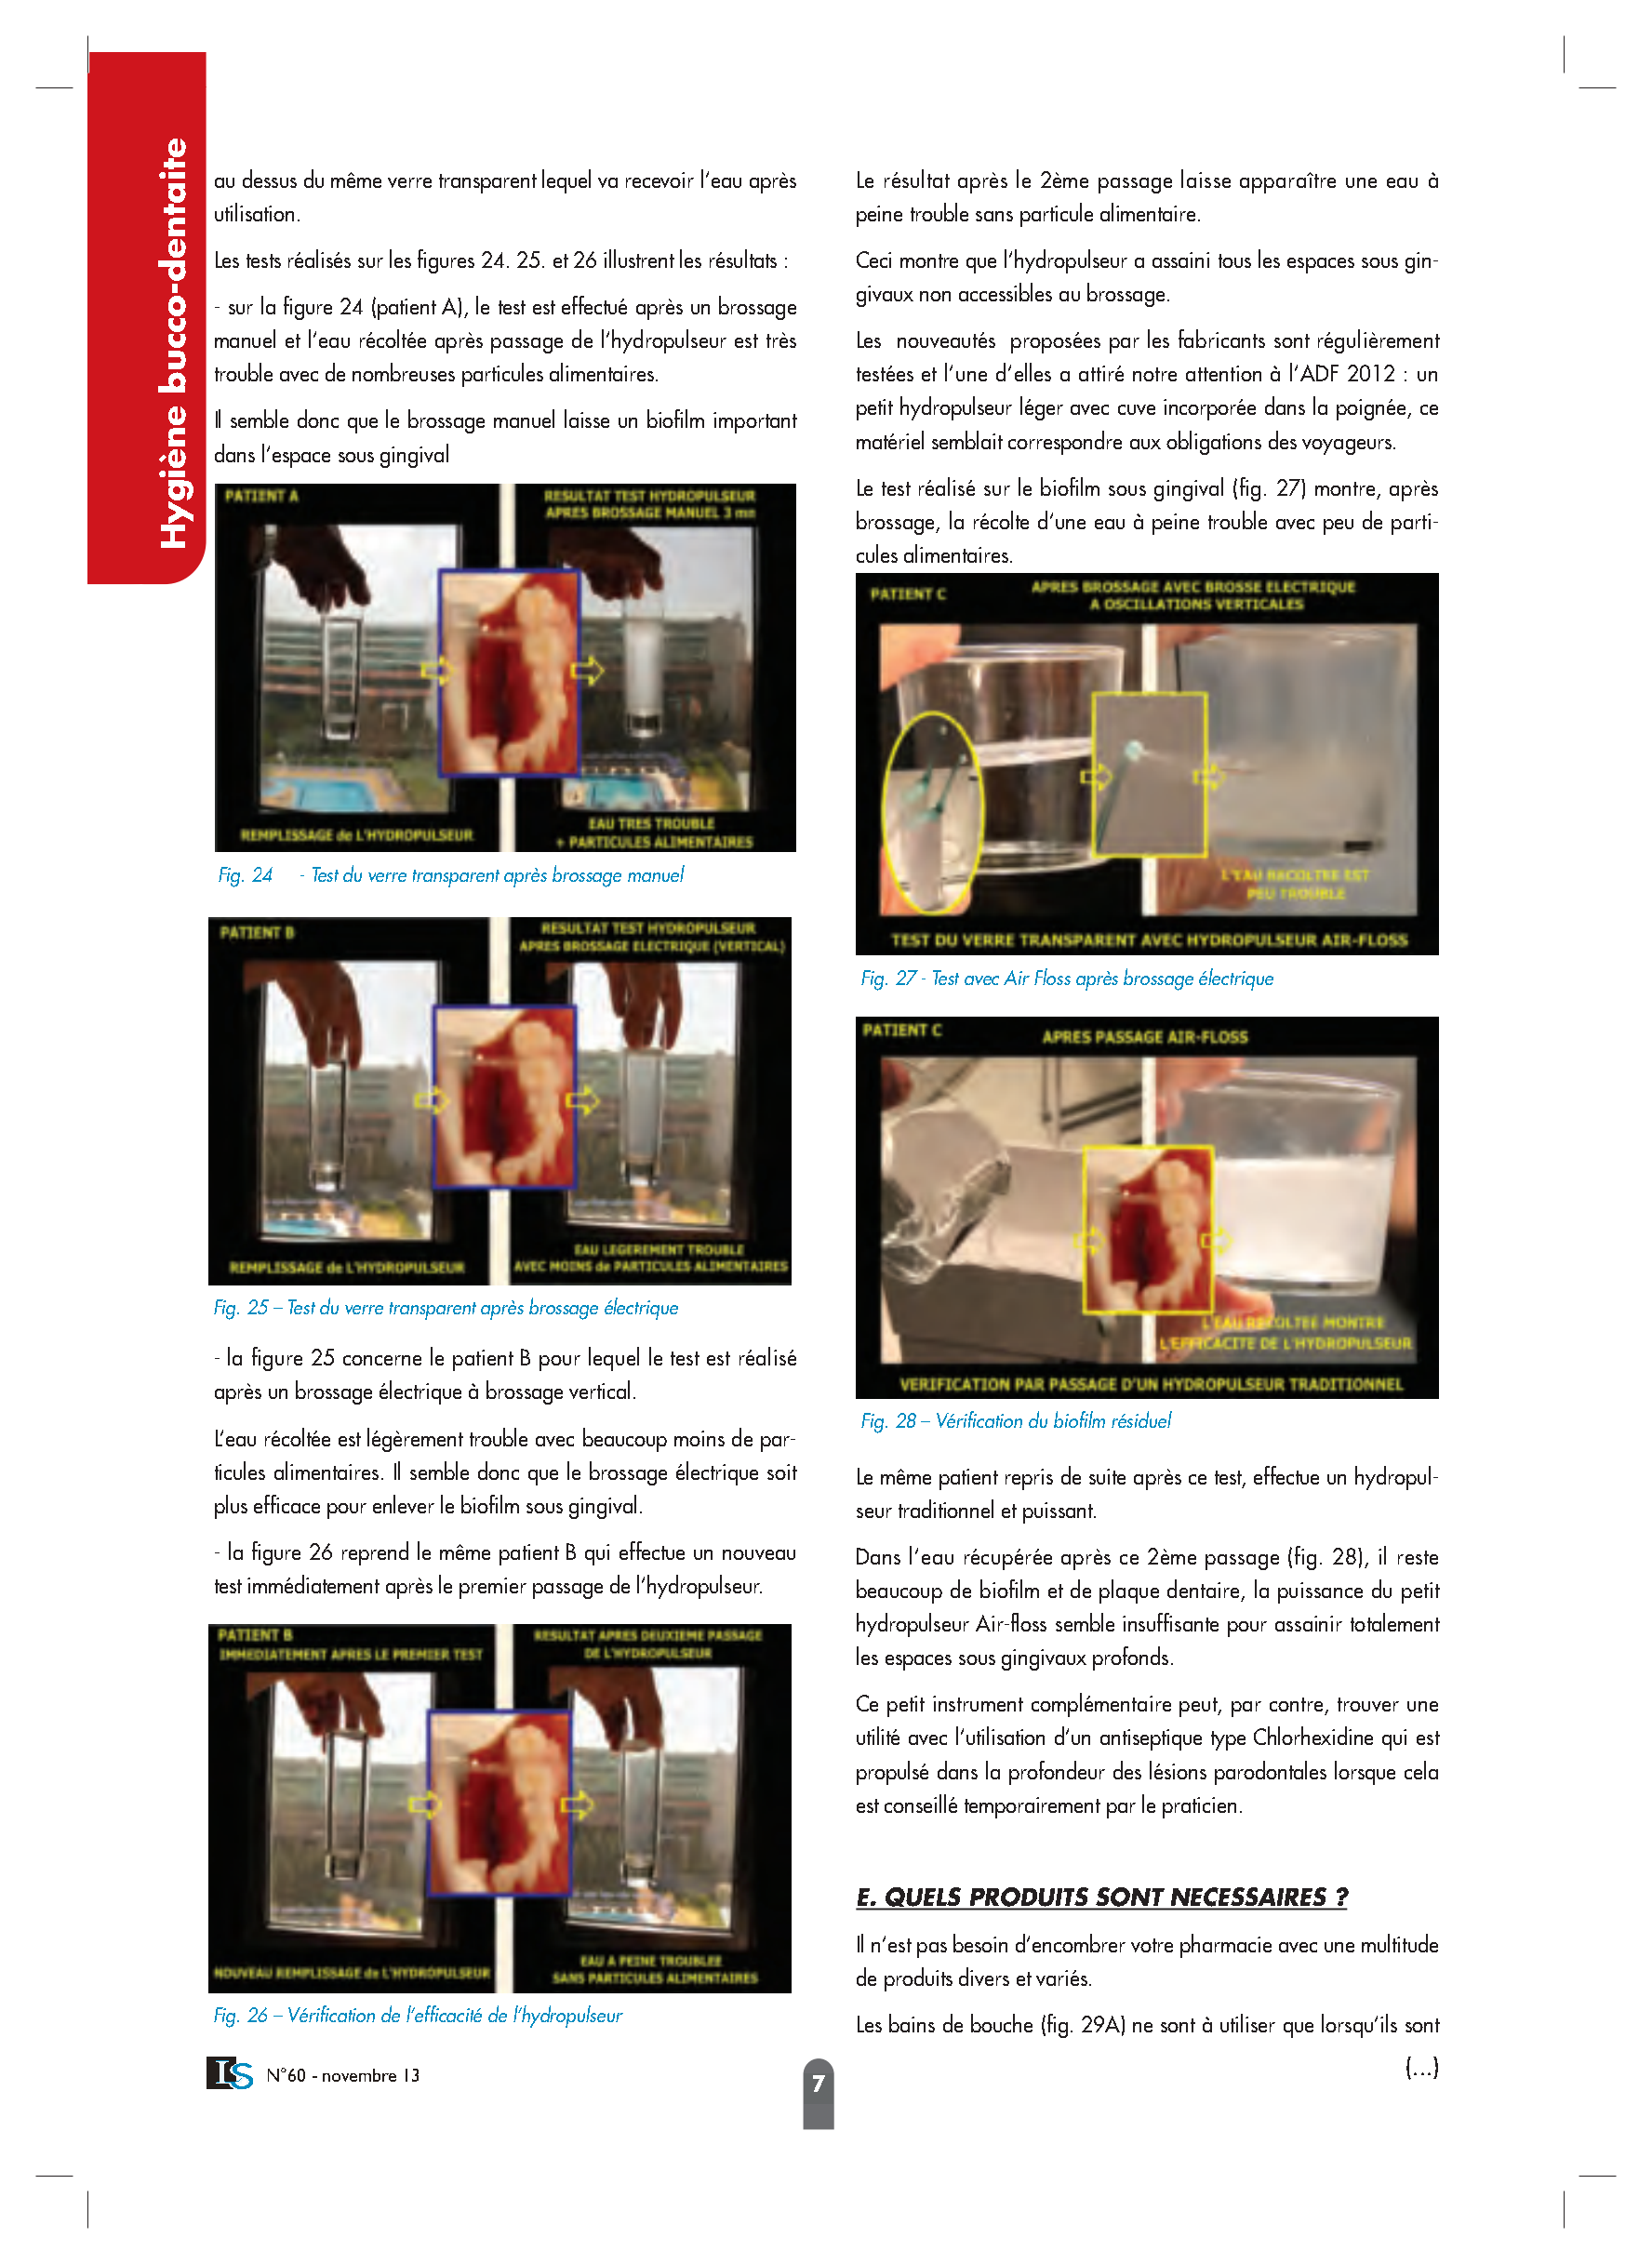 Etude11-page7